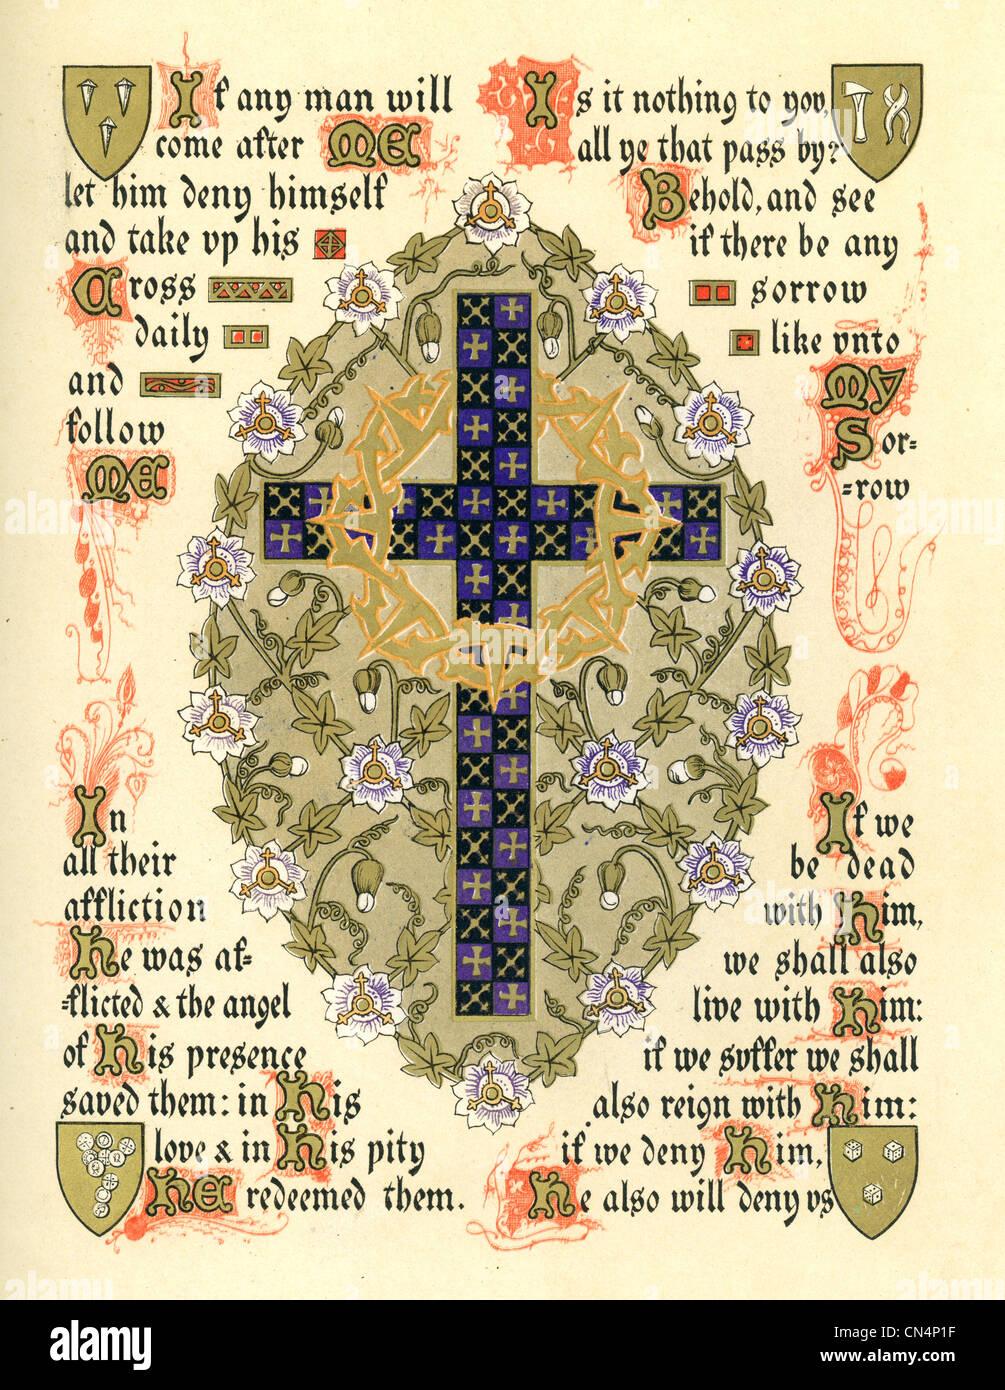 Illuminated symbol depicting the festival of Septuagesima and Lent. - Stock Image